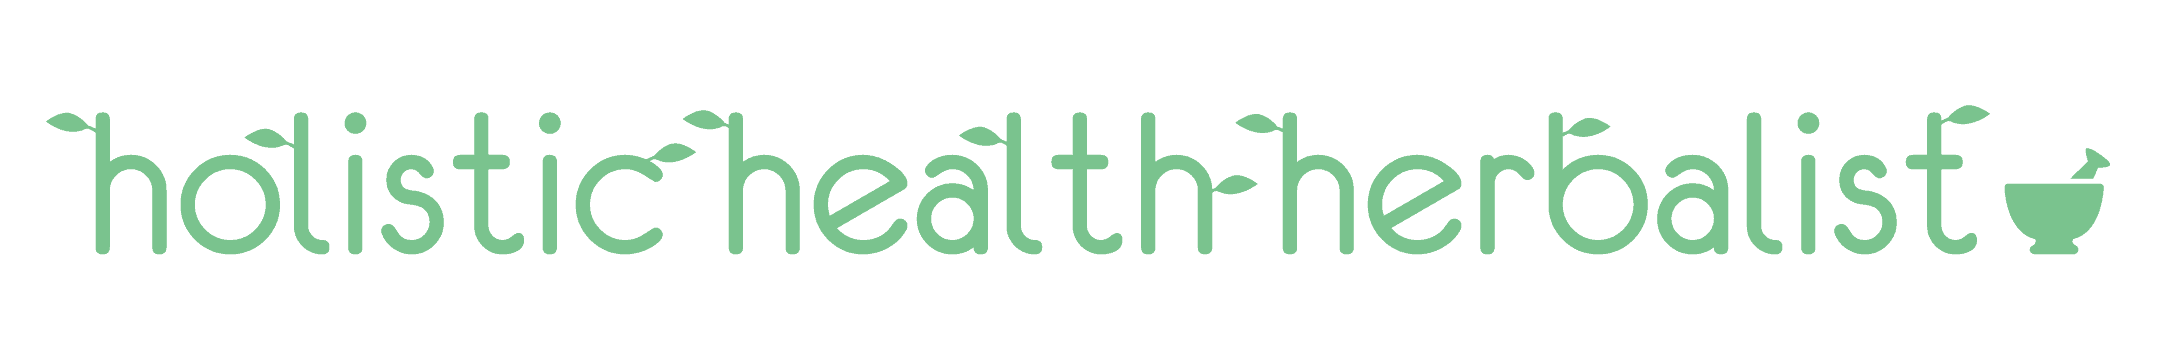 Holistic Health Herbalist